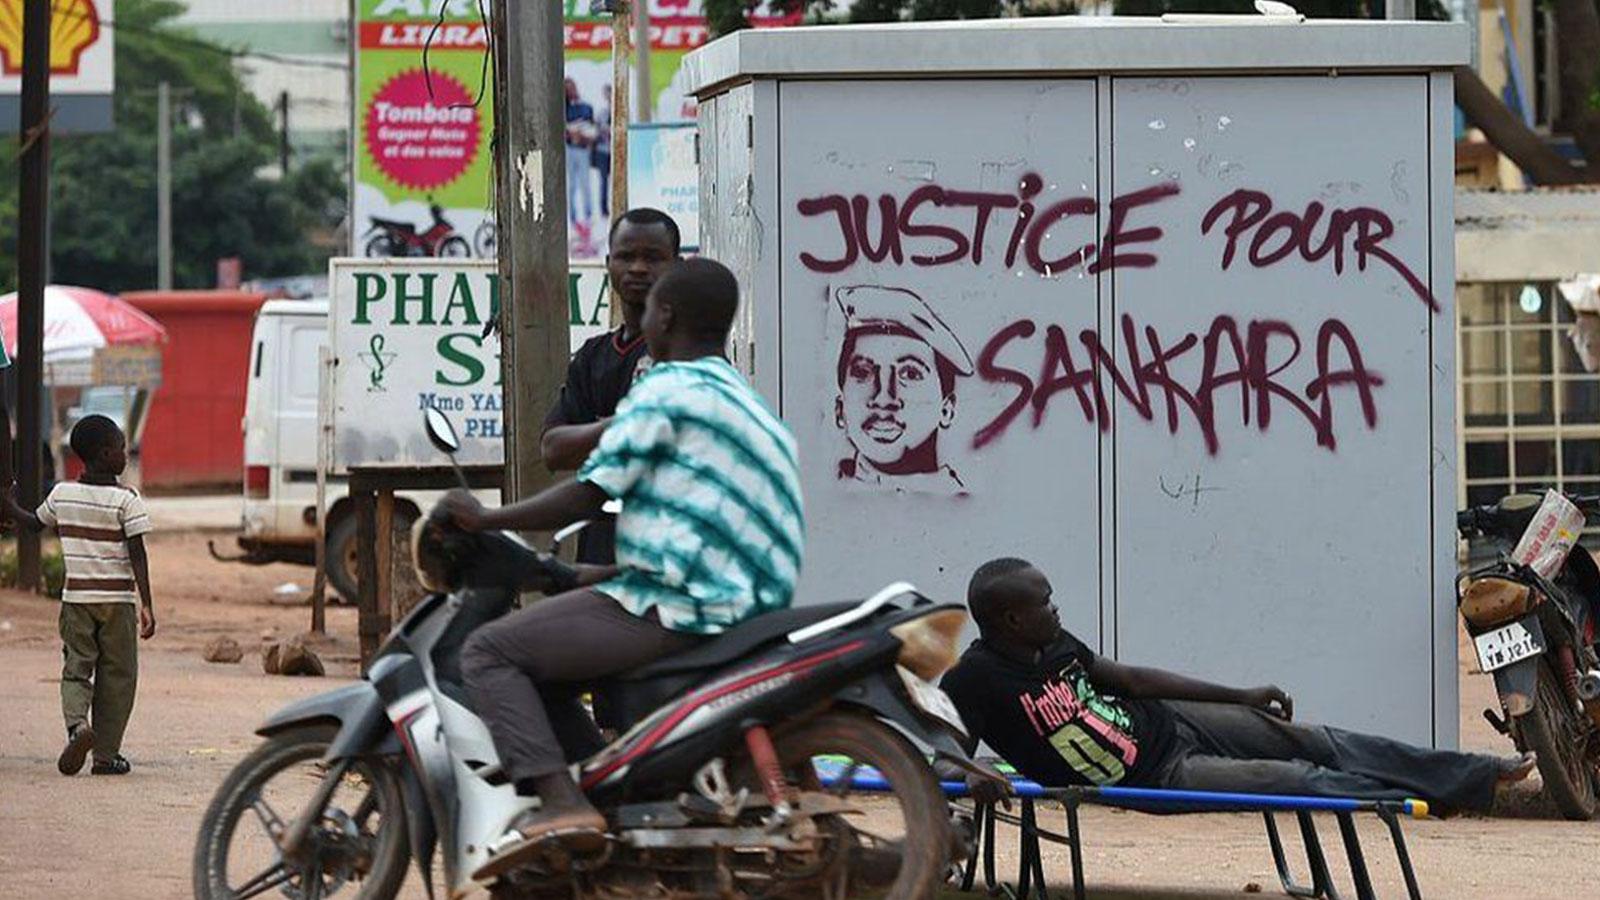 Sakara's supporters have long demanded justice